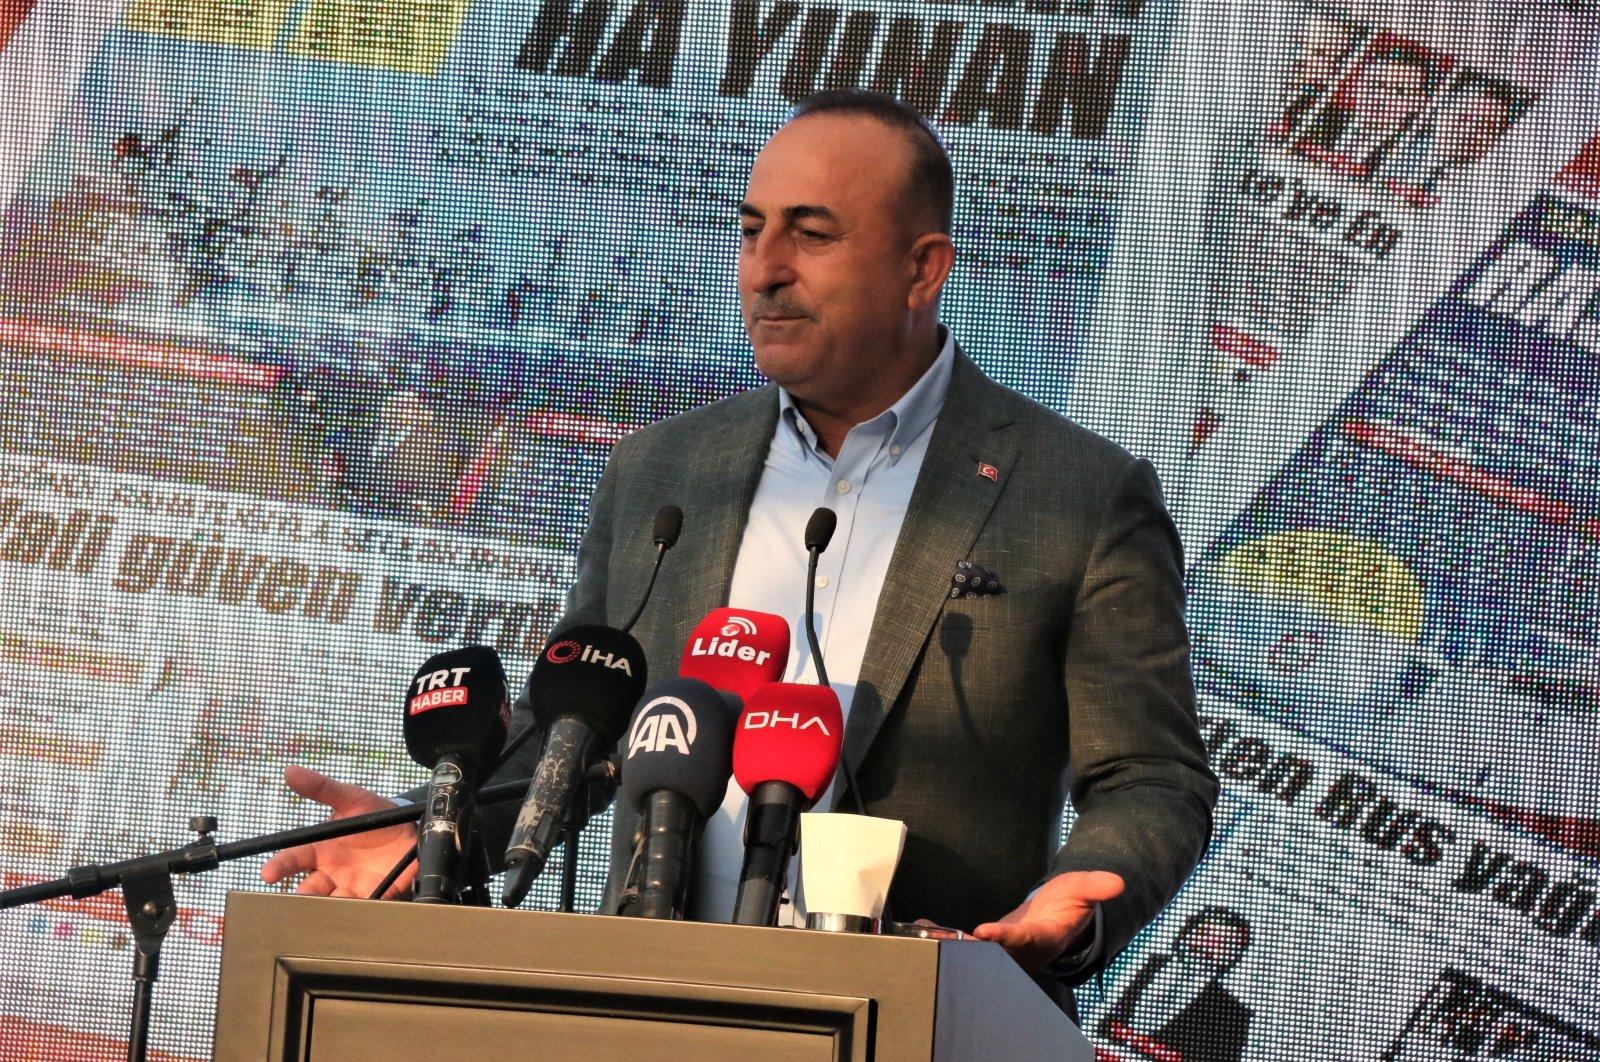 Turkish Foreign Minister Mevlüt Çavuşoğlu speaking to journalists in Northern Cyprus, July 22, 2021 (IHA Photo)